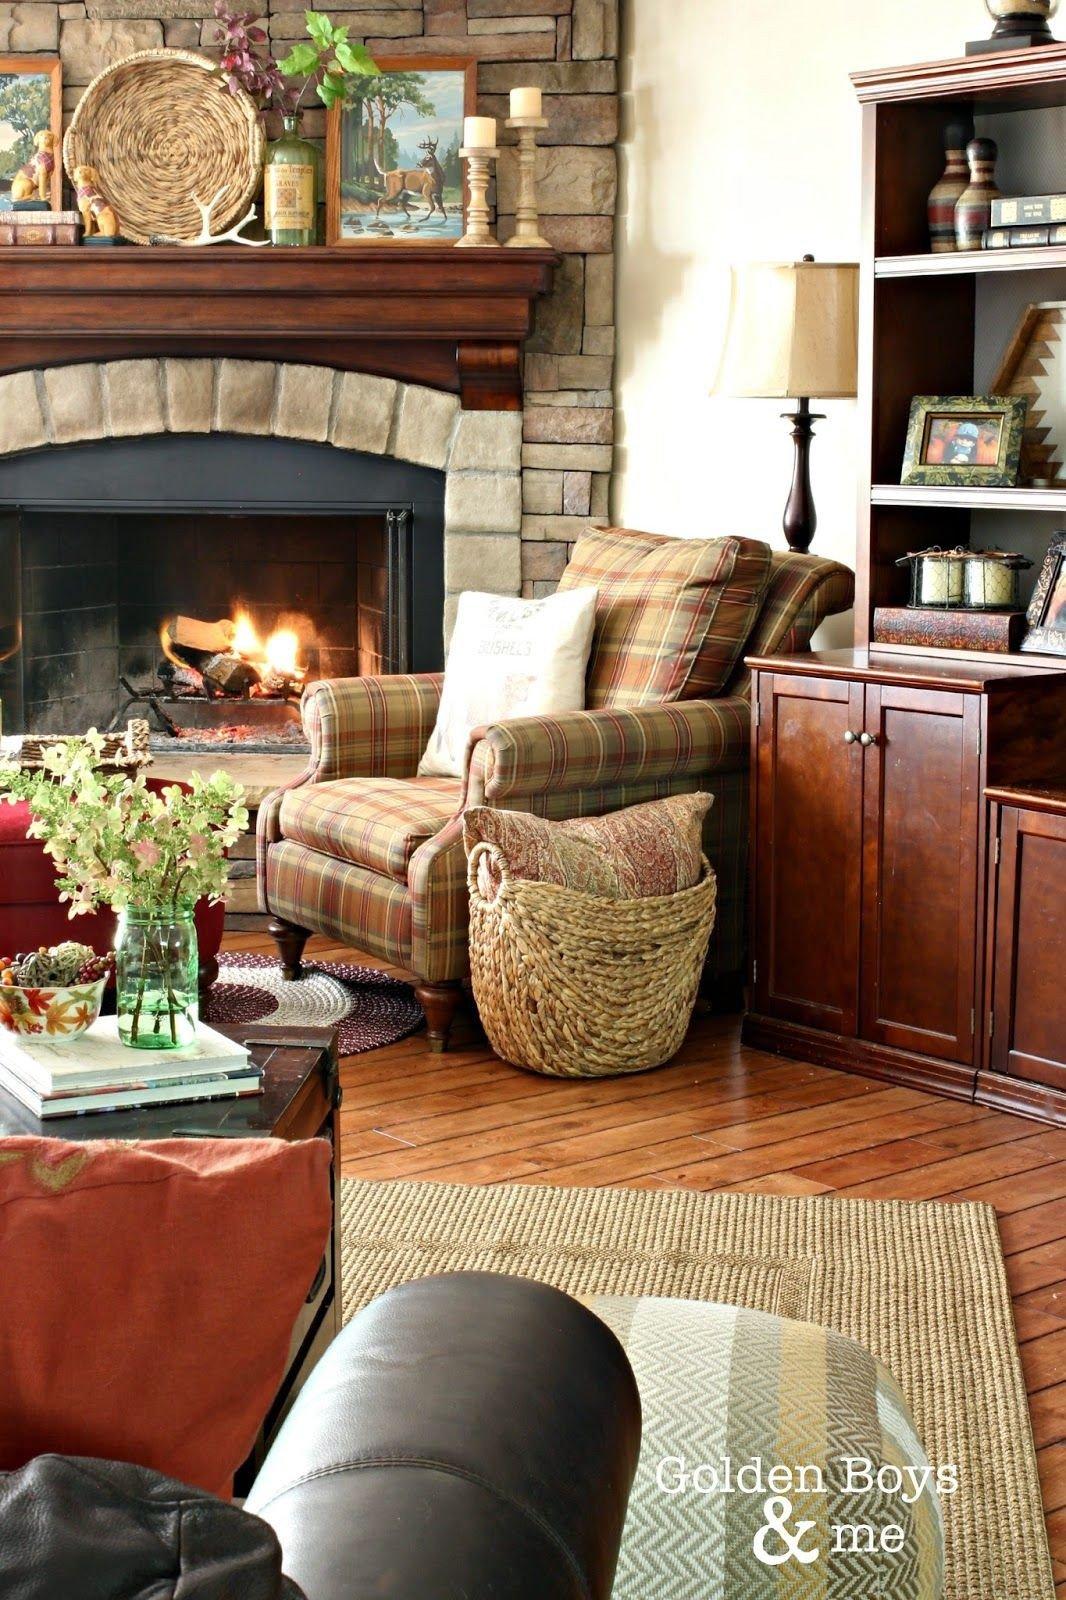 Living Room Decor with Fireplace Fresh Our Fall Family Room Diy Home Decor Ideas